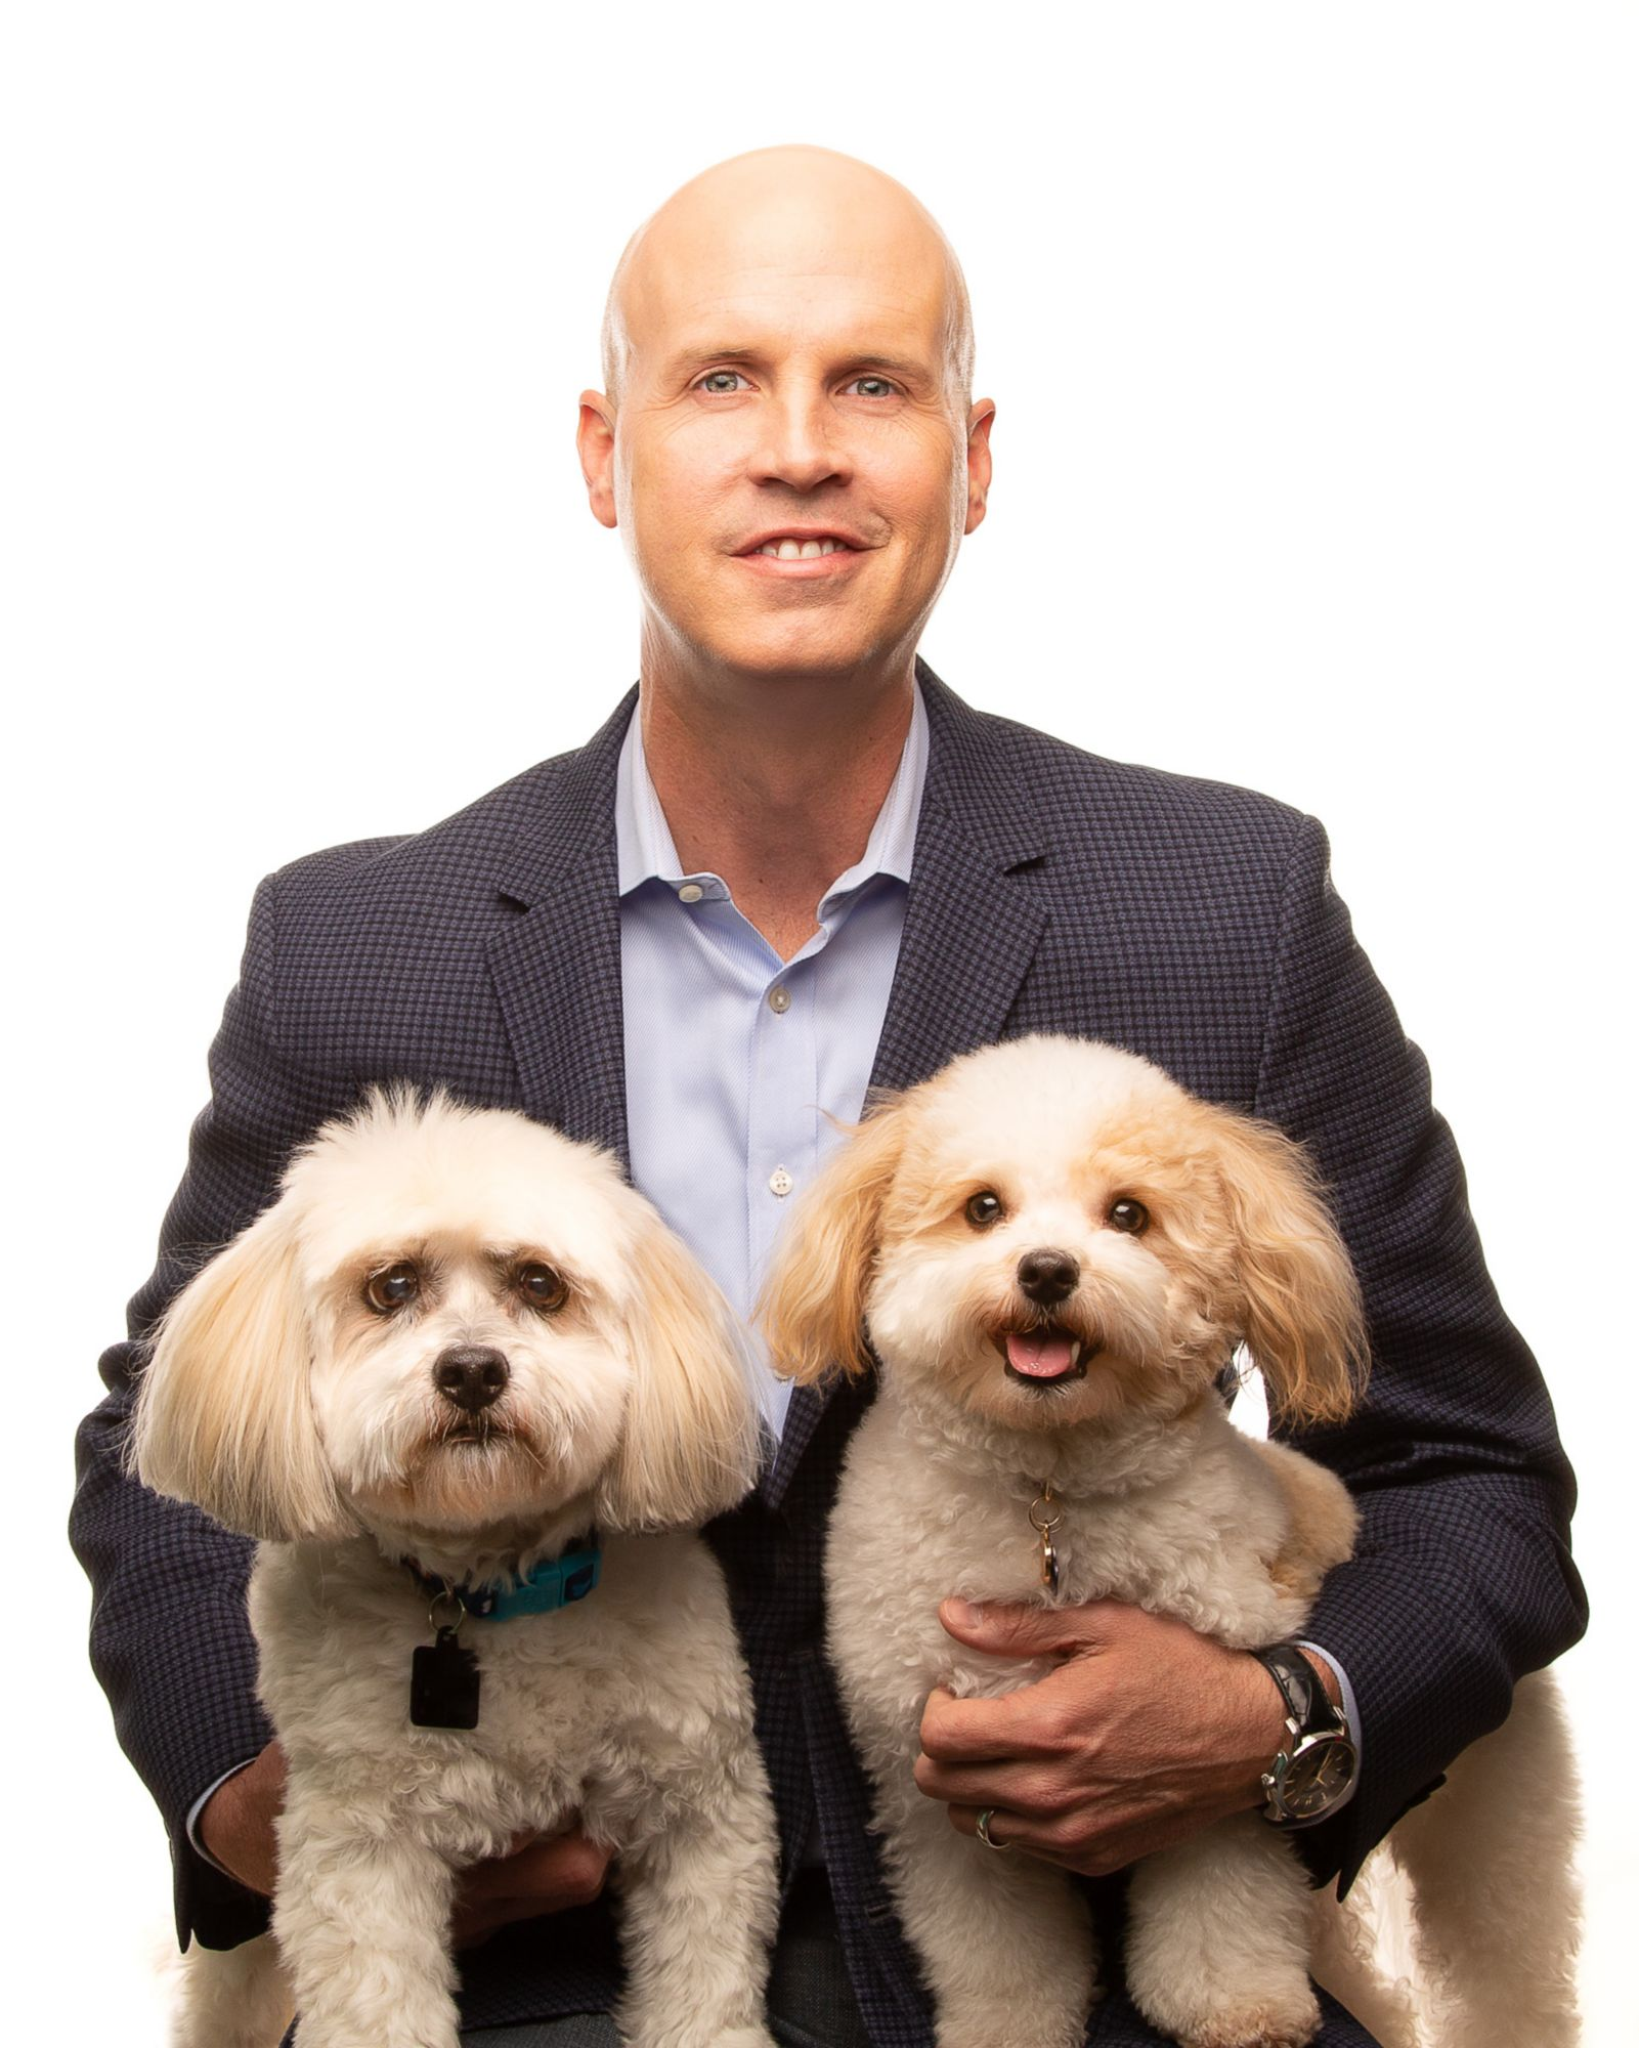 J.K. Symancyk, PetSmart CEO